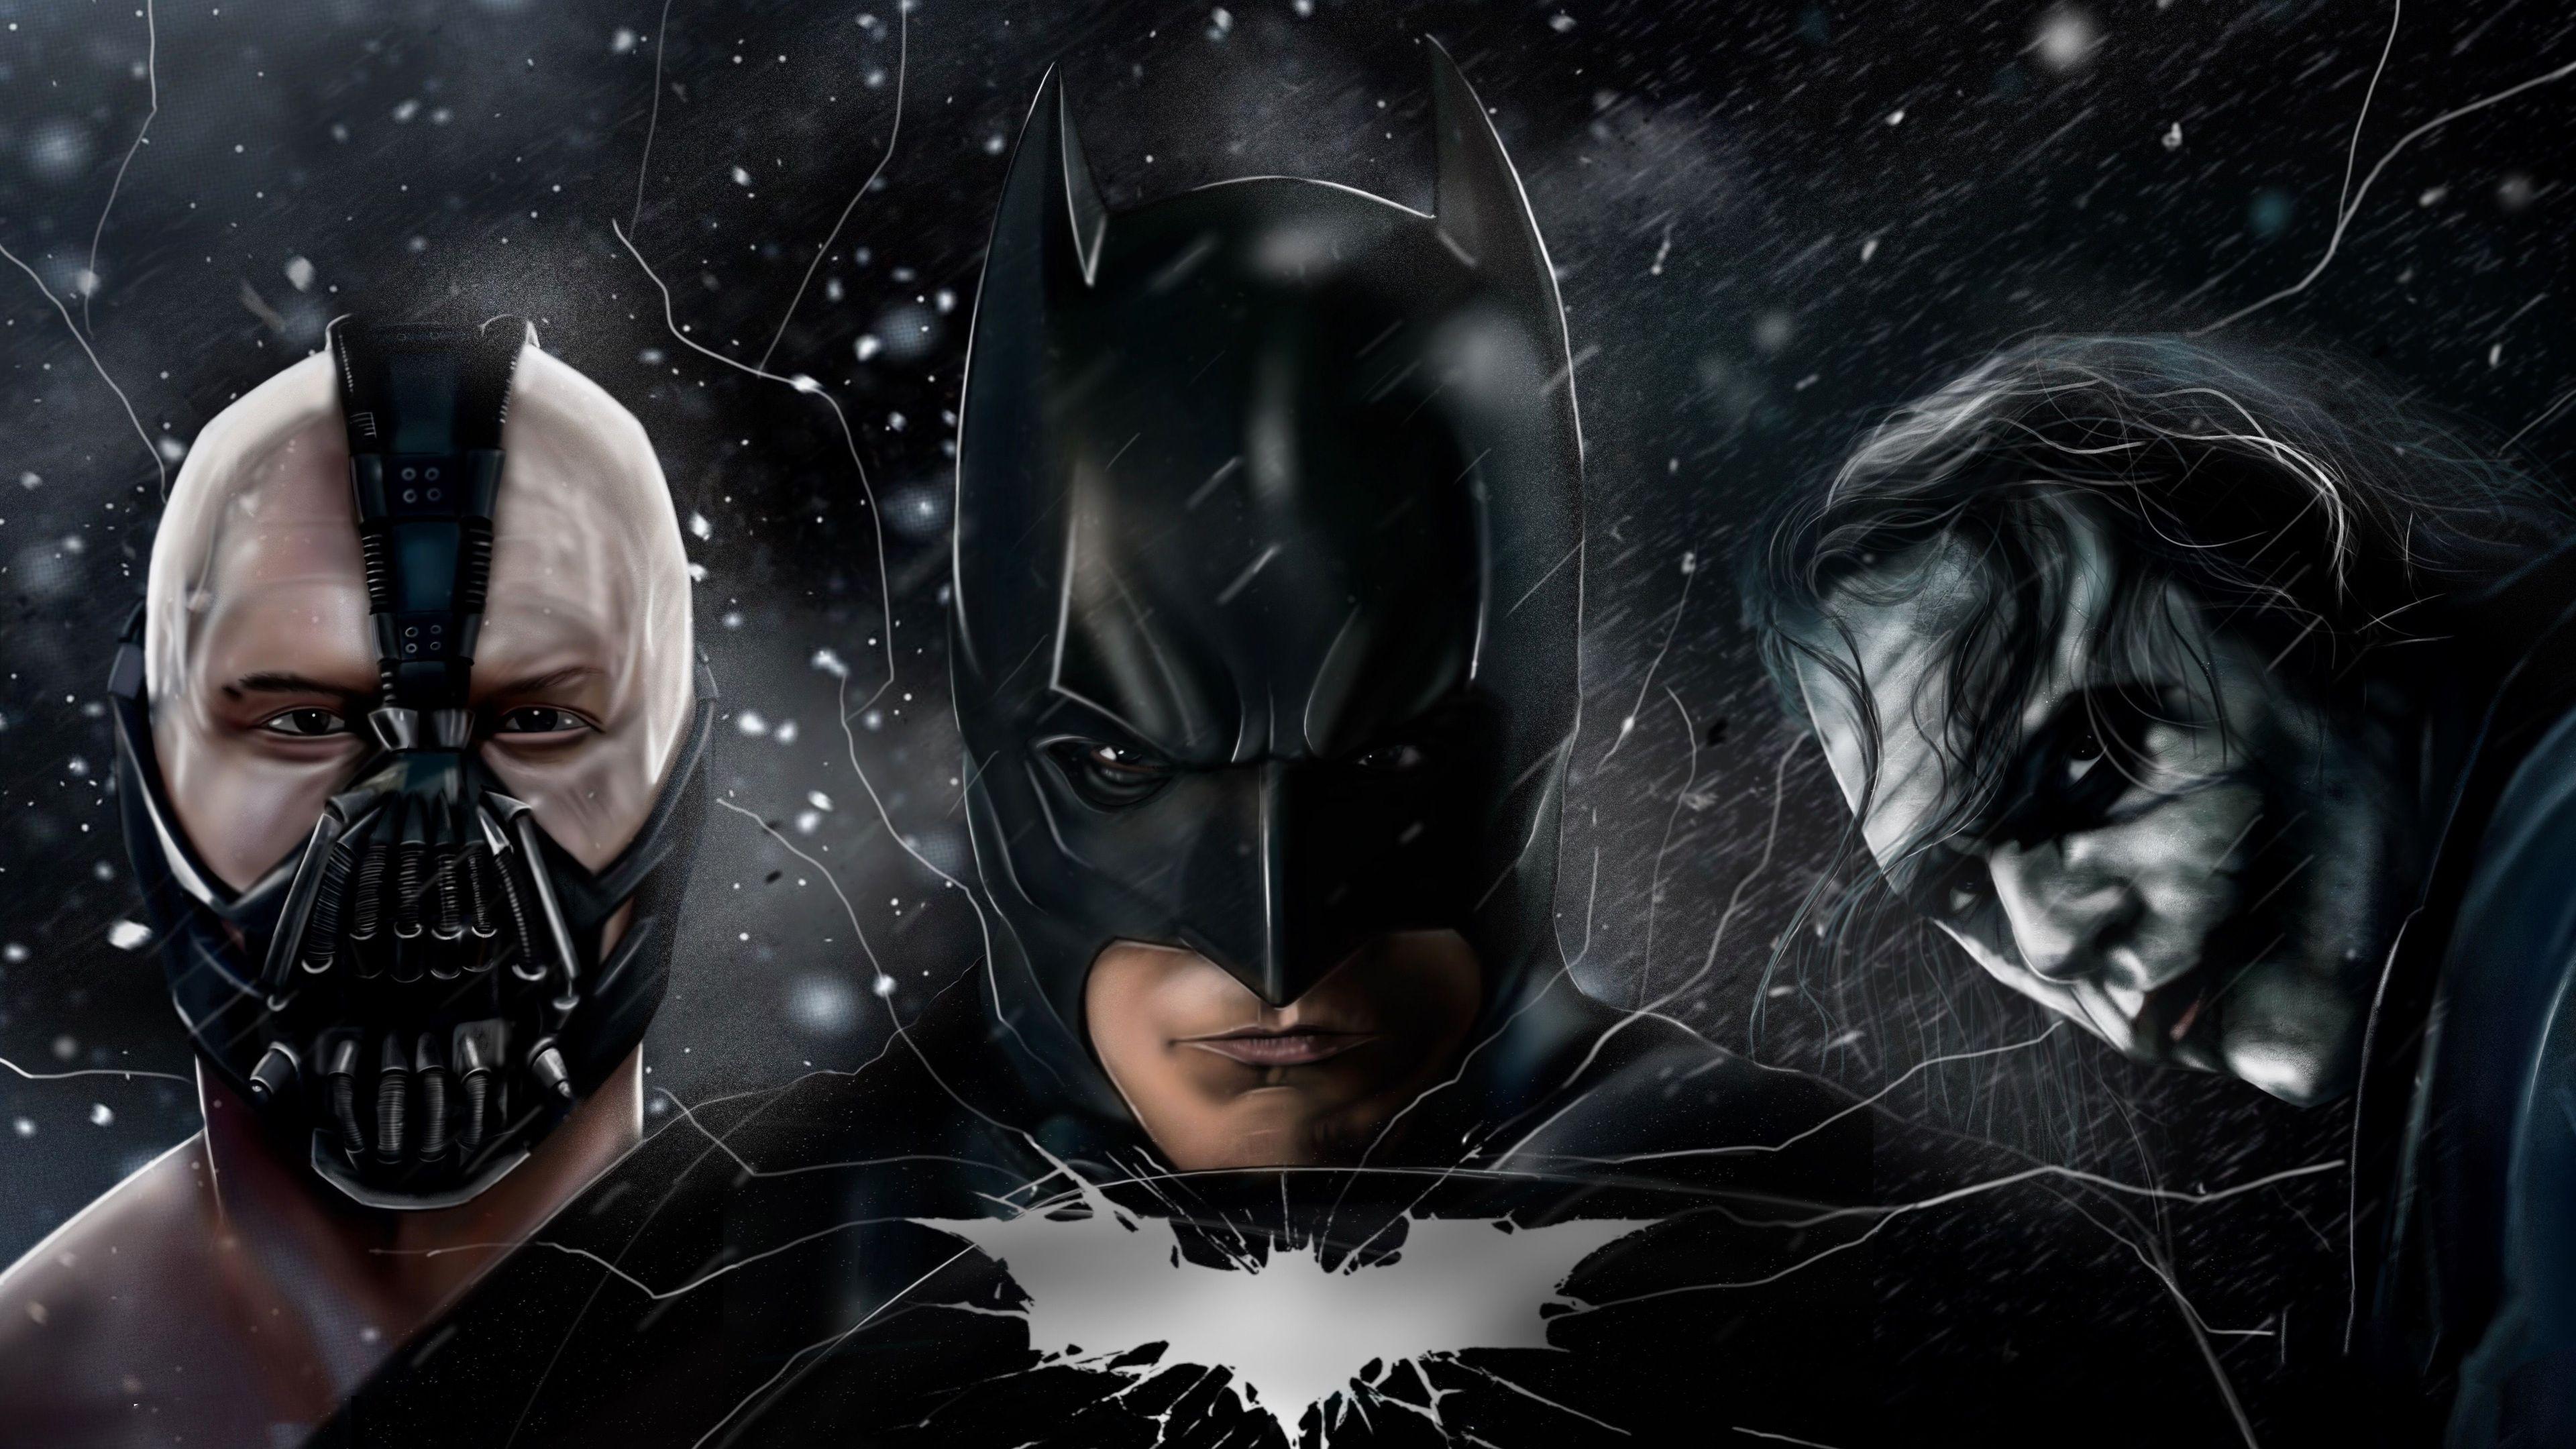 The Dark Knight Batman Joker Bane 5k Supervillain Wallpapers Superheroes Wallpapers Joker Wallpapers Dark Knight Wallpaper Batman Wallpaper Joker Wallpapers Batman dark knight wallpaper hd 1080p